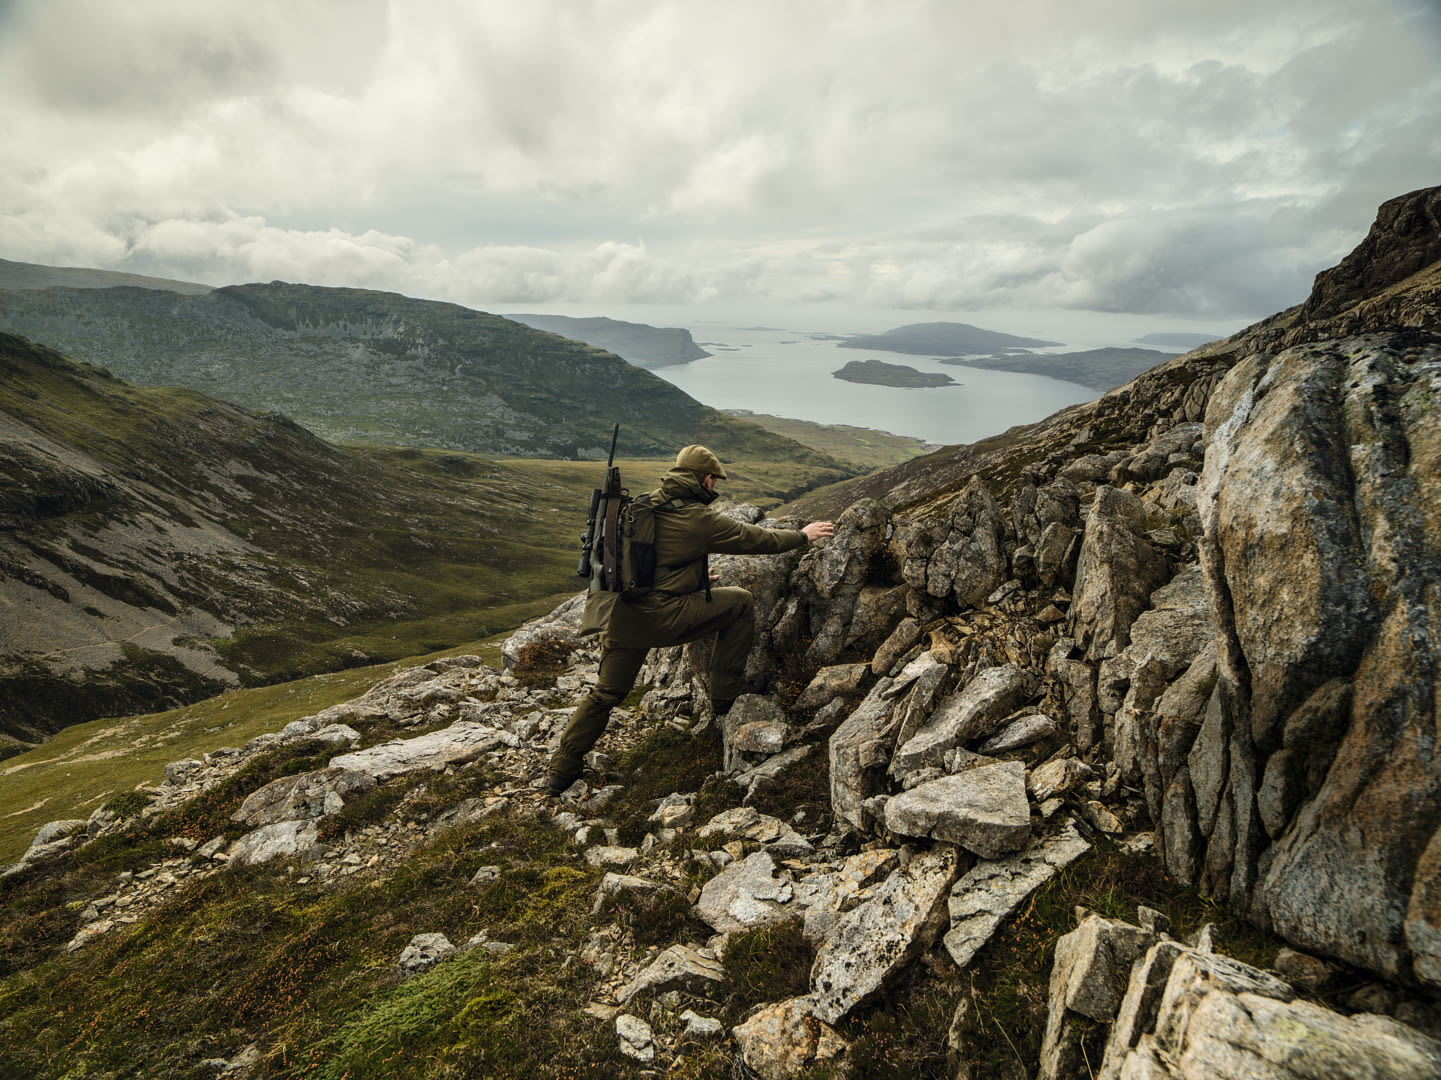 Swarovski Optik dS Isle of Mull – the ultimate challenge for hunters man climbing